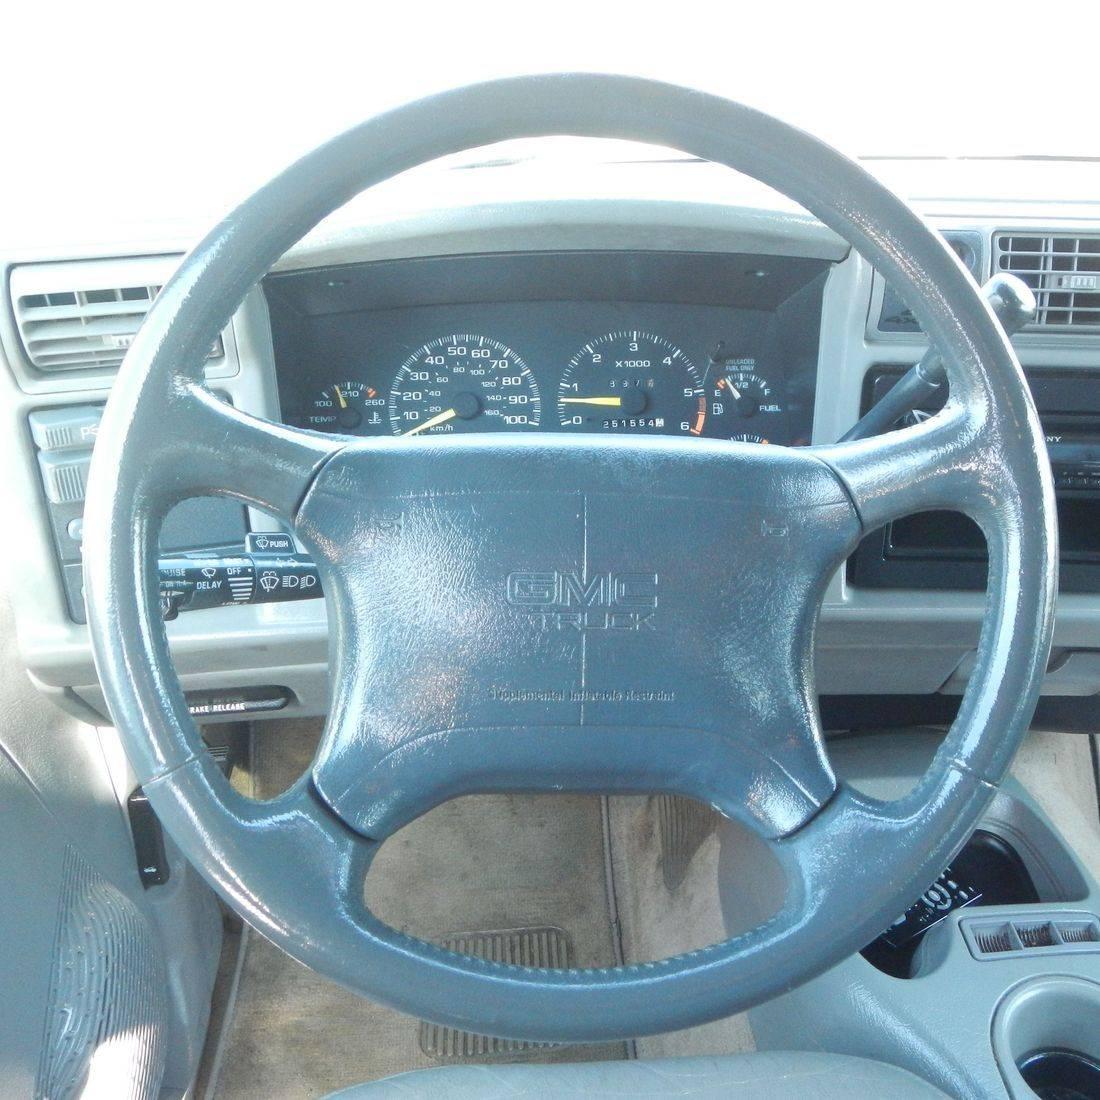 1995 GMC Jimmy SLT 4x4